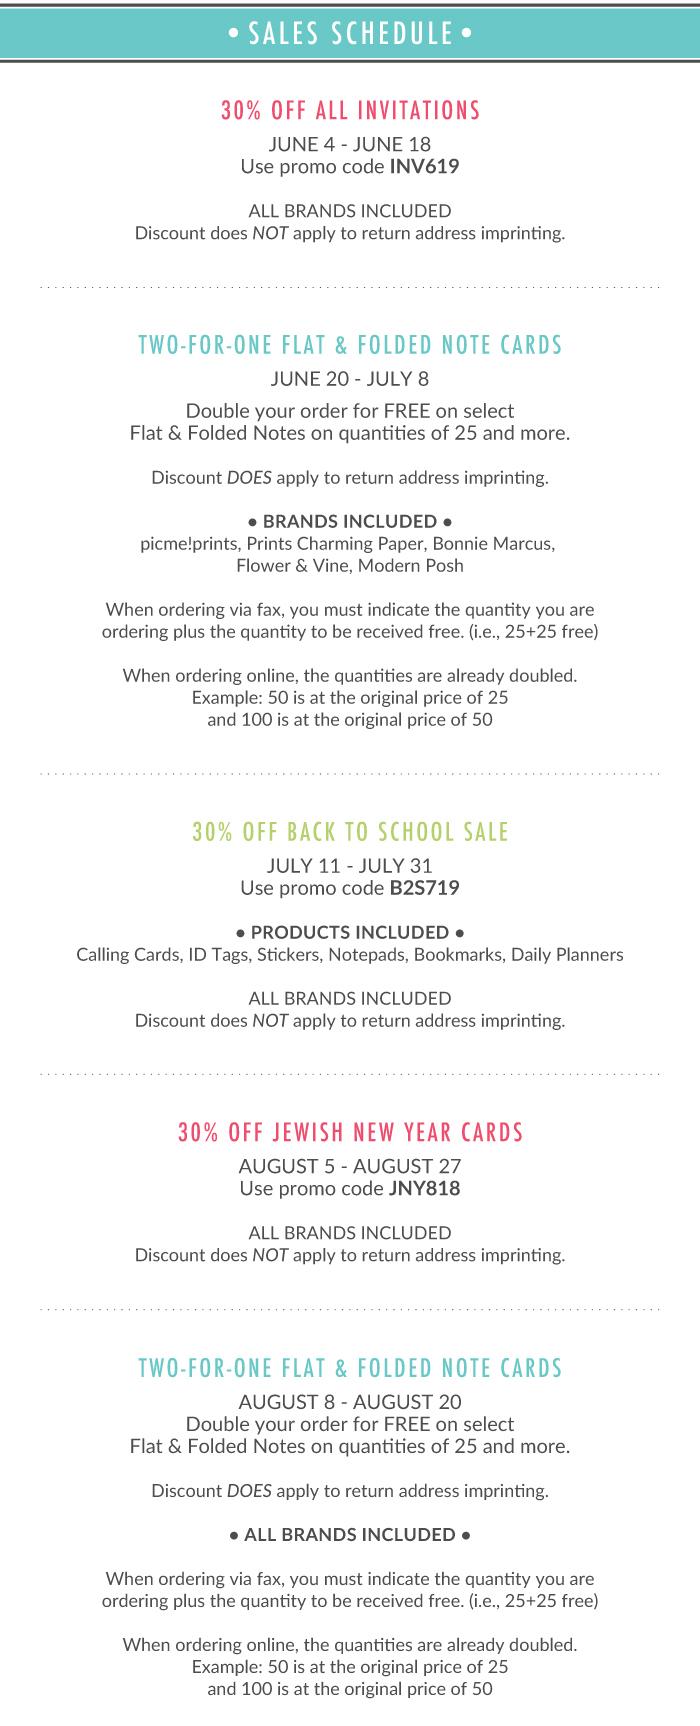 Printswell Summer Sales